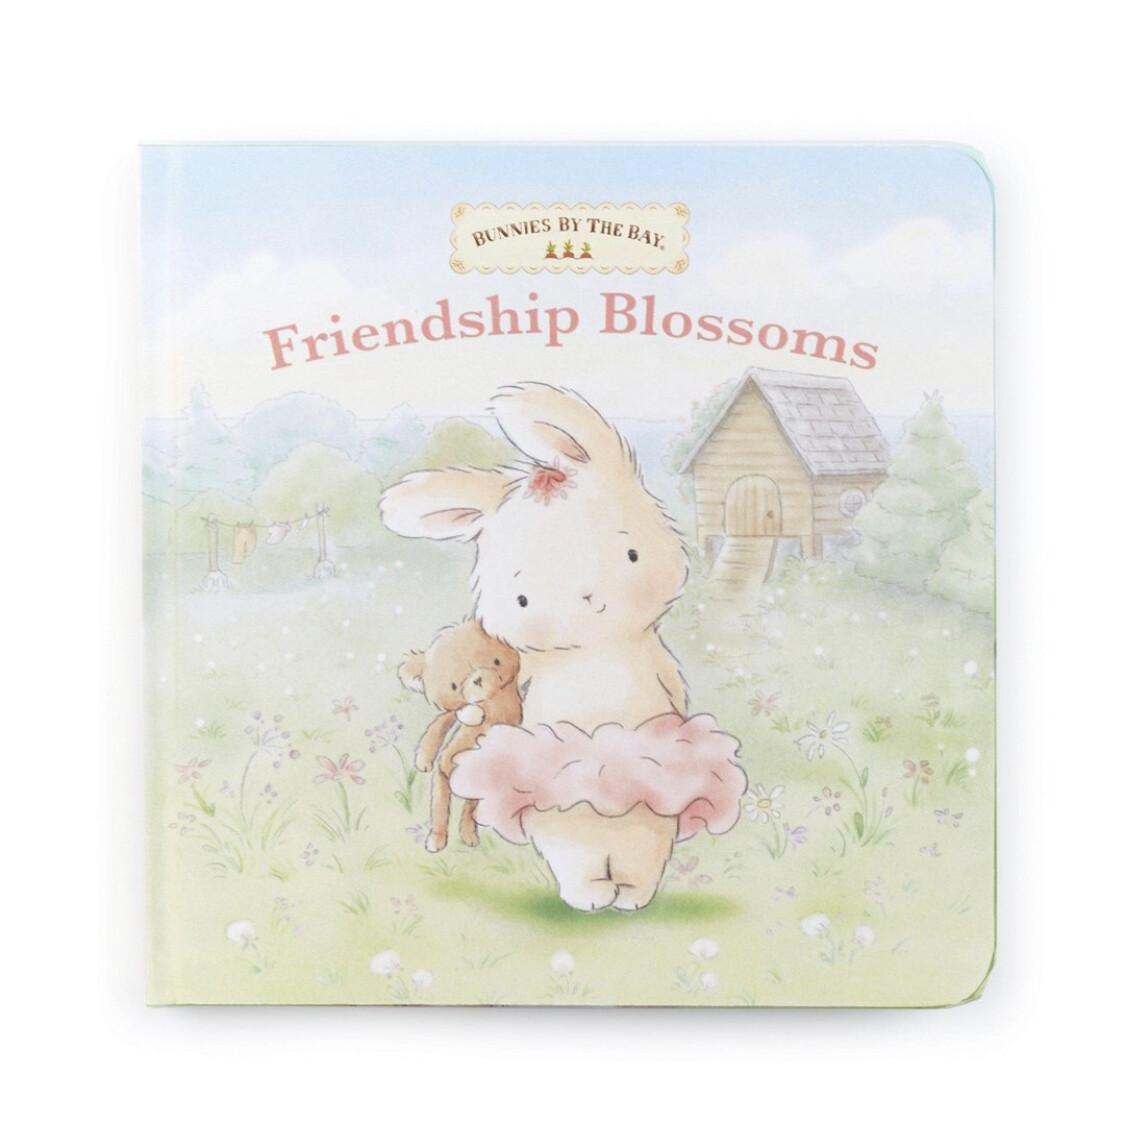 Friendships Blossom Board Book